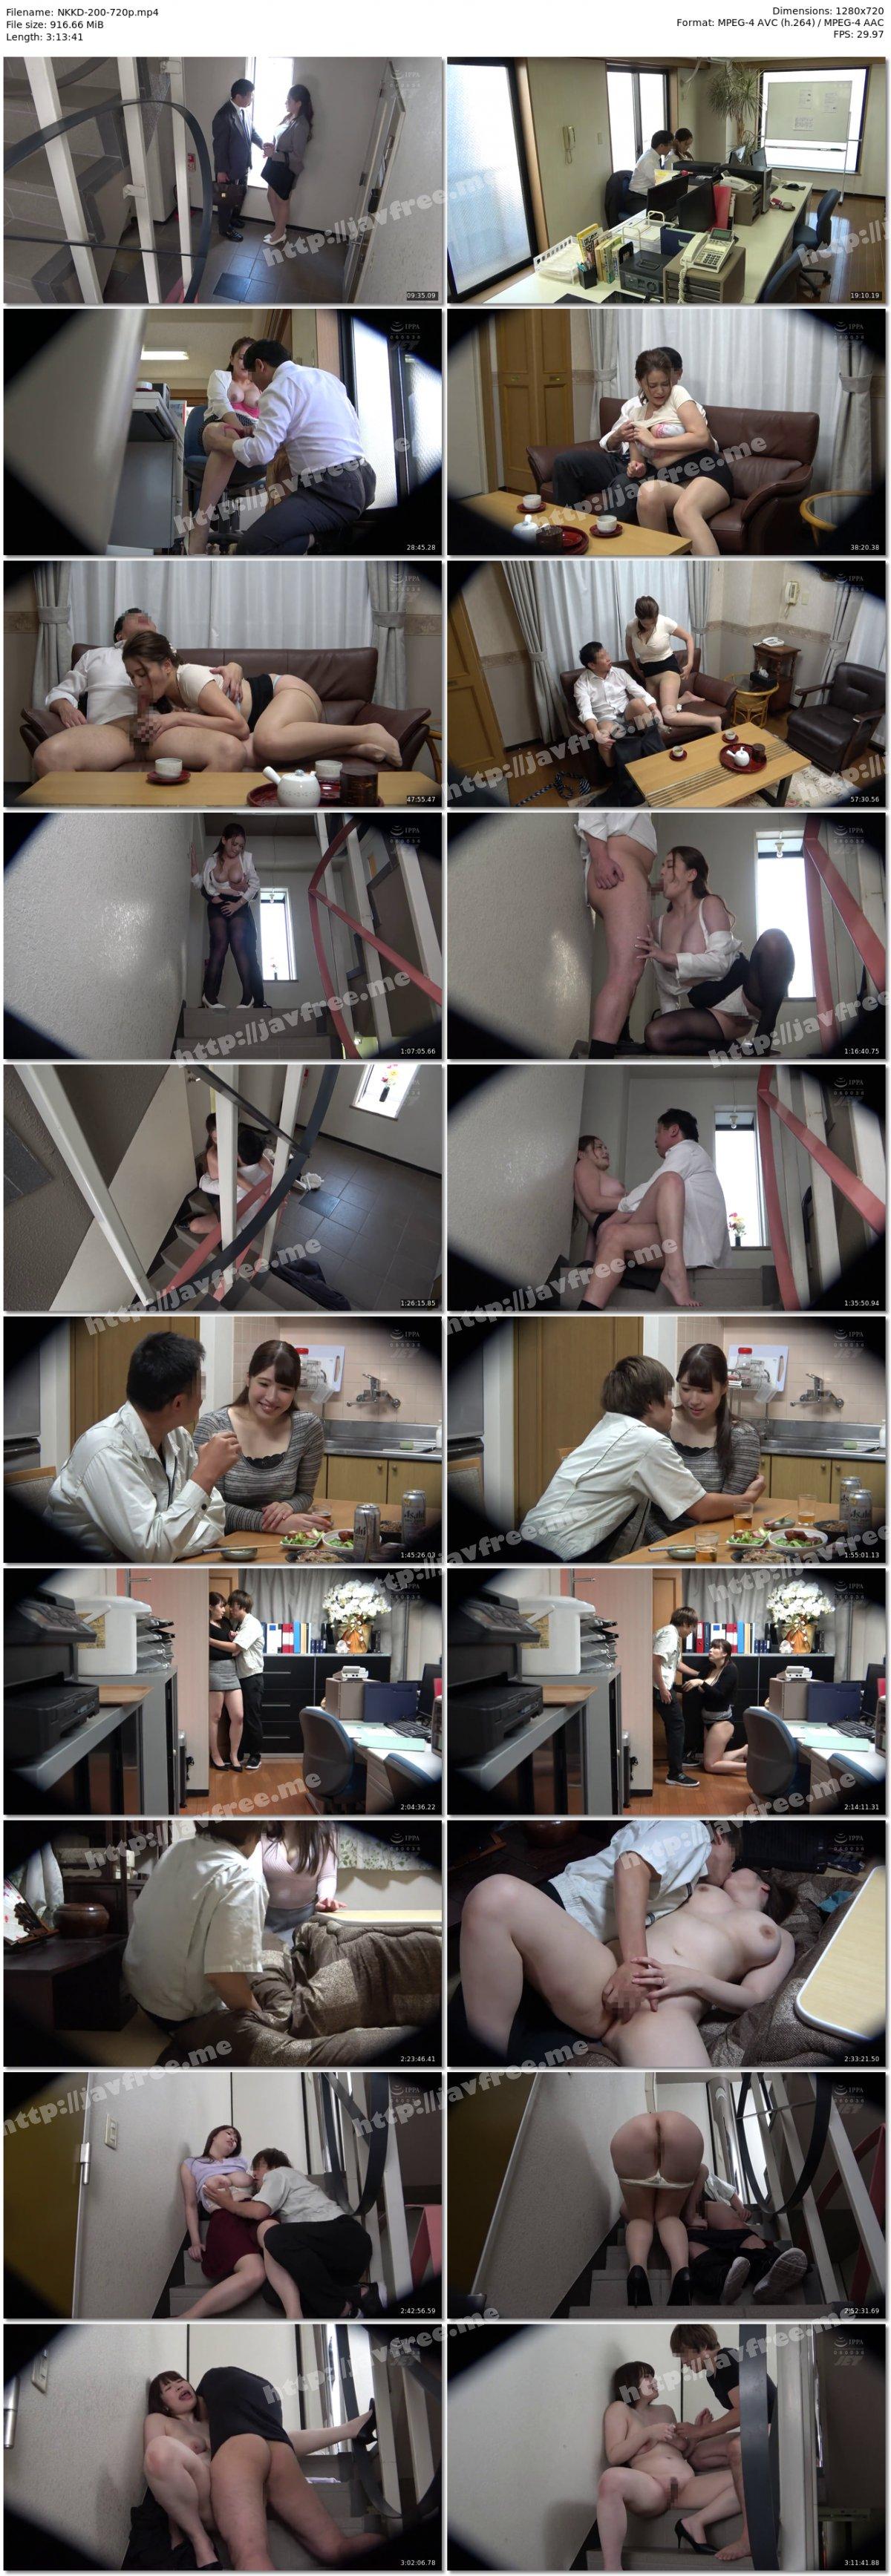 [HD][NKKD-200] 会社の非常階段で妻と同僚がヤっていた!! - image NKKD-200-720p on https://javfree.me